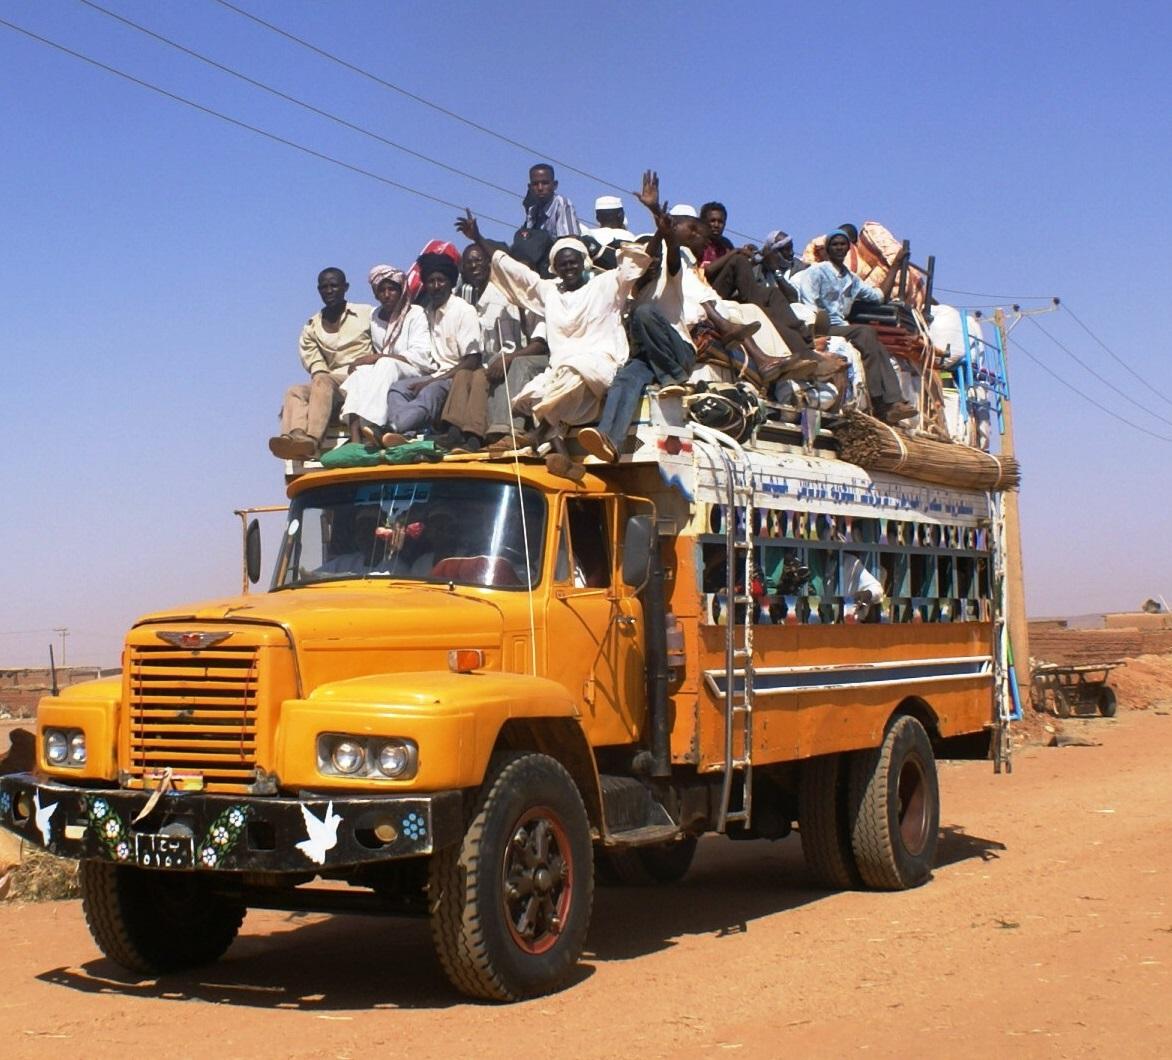 https://bubo.sk/uploads/galleries/7407/lubosfellner_sudan_truck.jpg